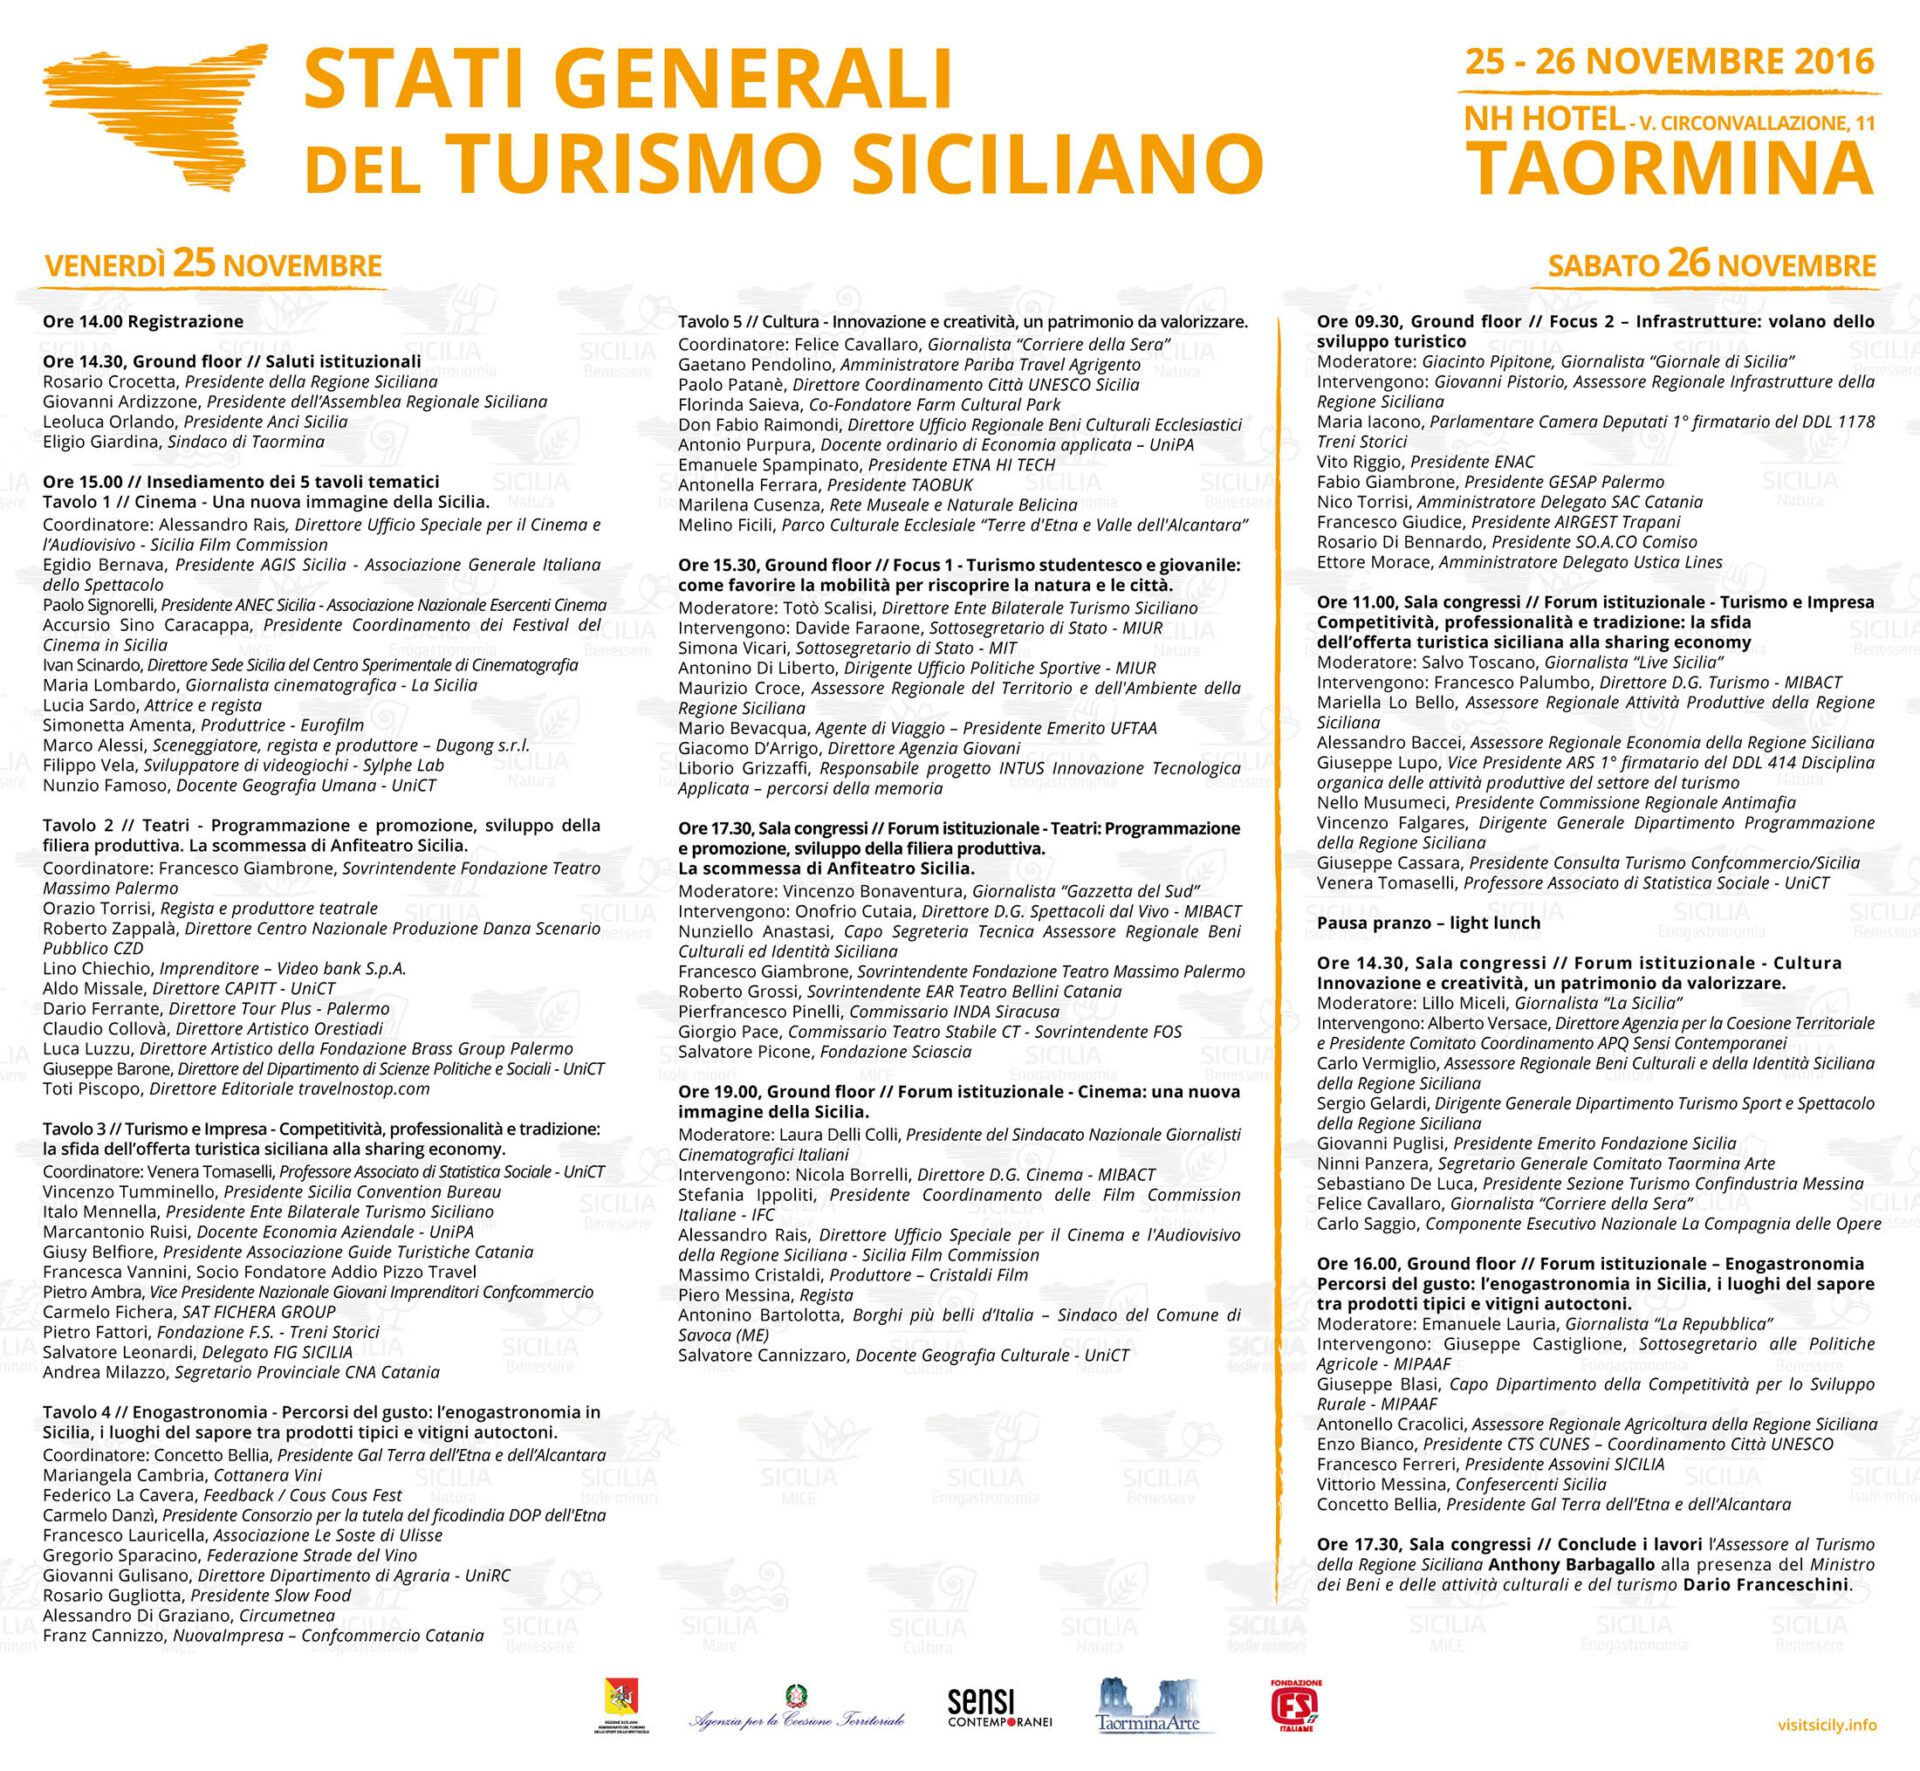 taormina_stati_turismo_25_11_2016